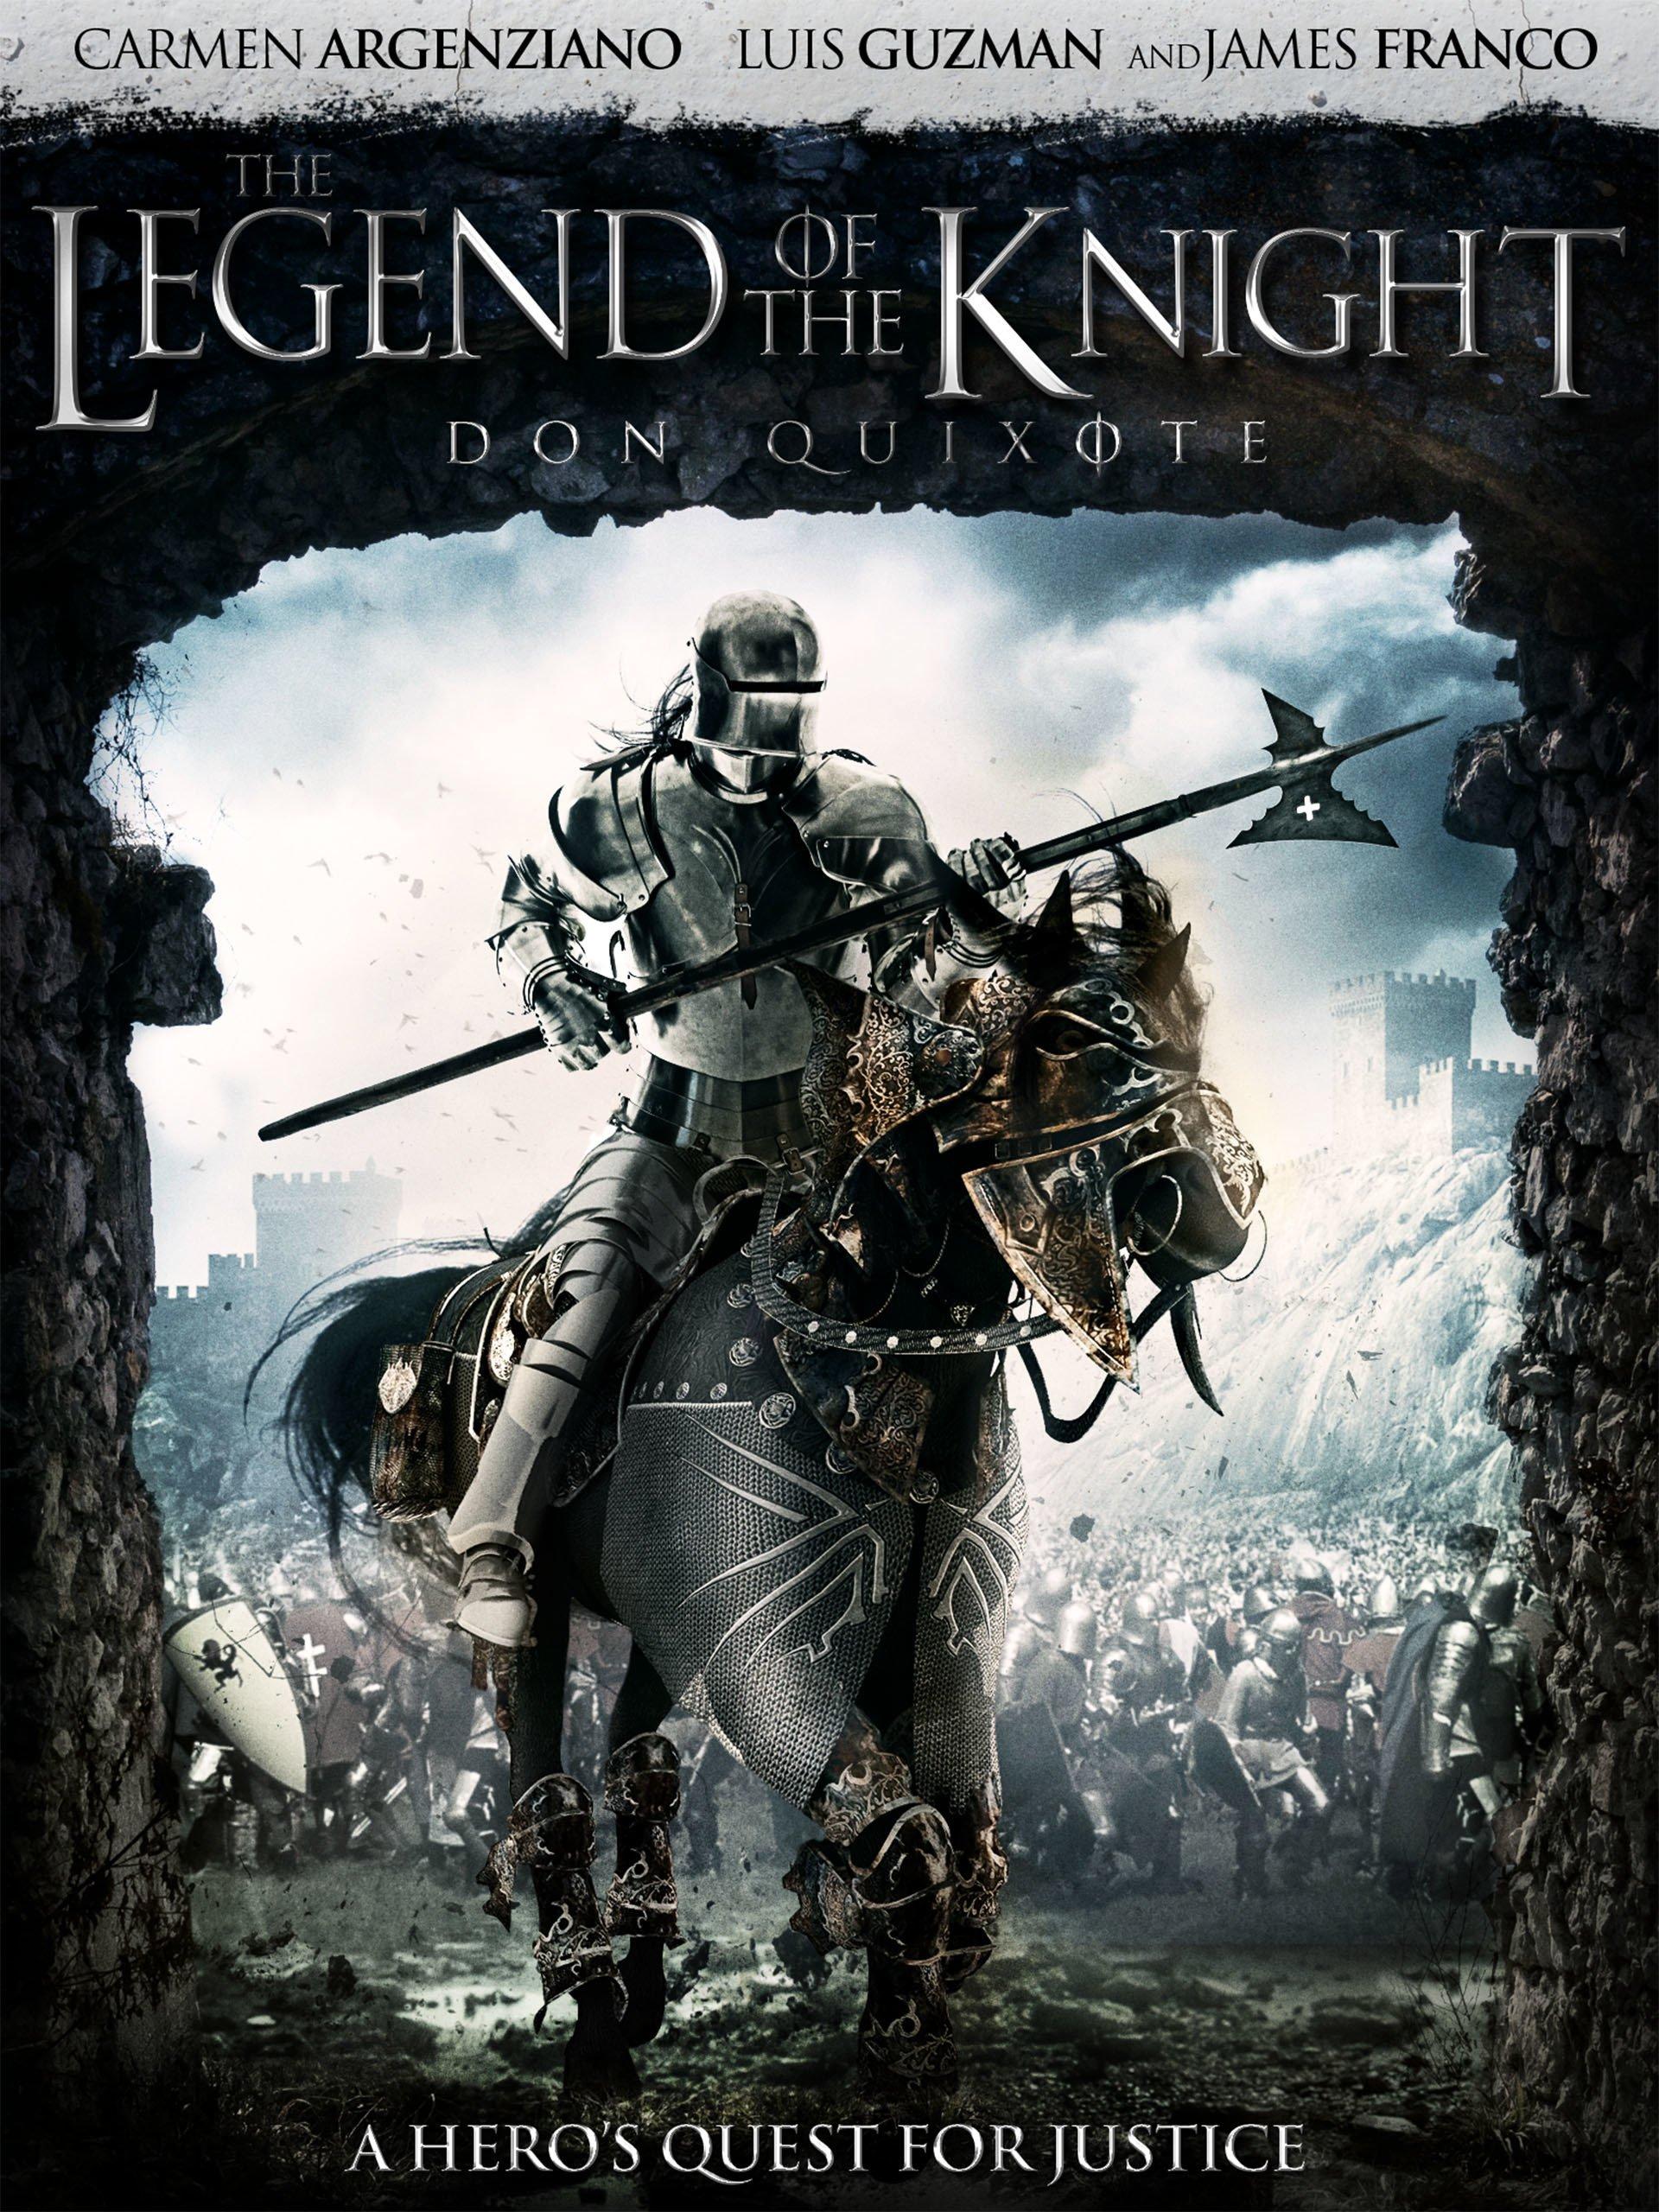 The Legend of the Knight: Don Quixote